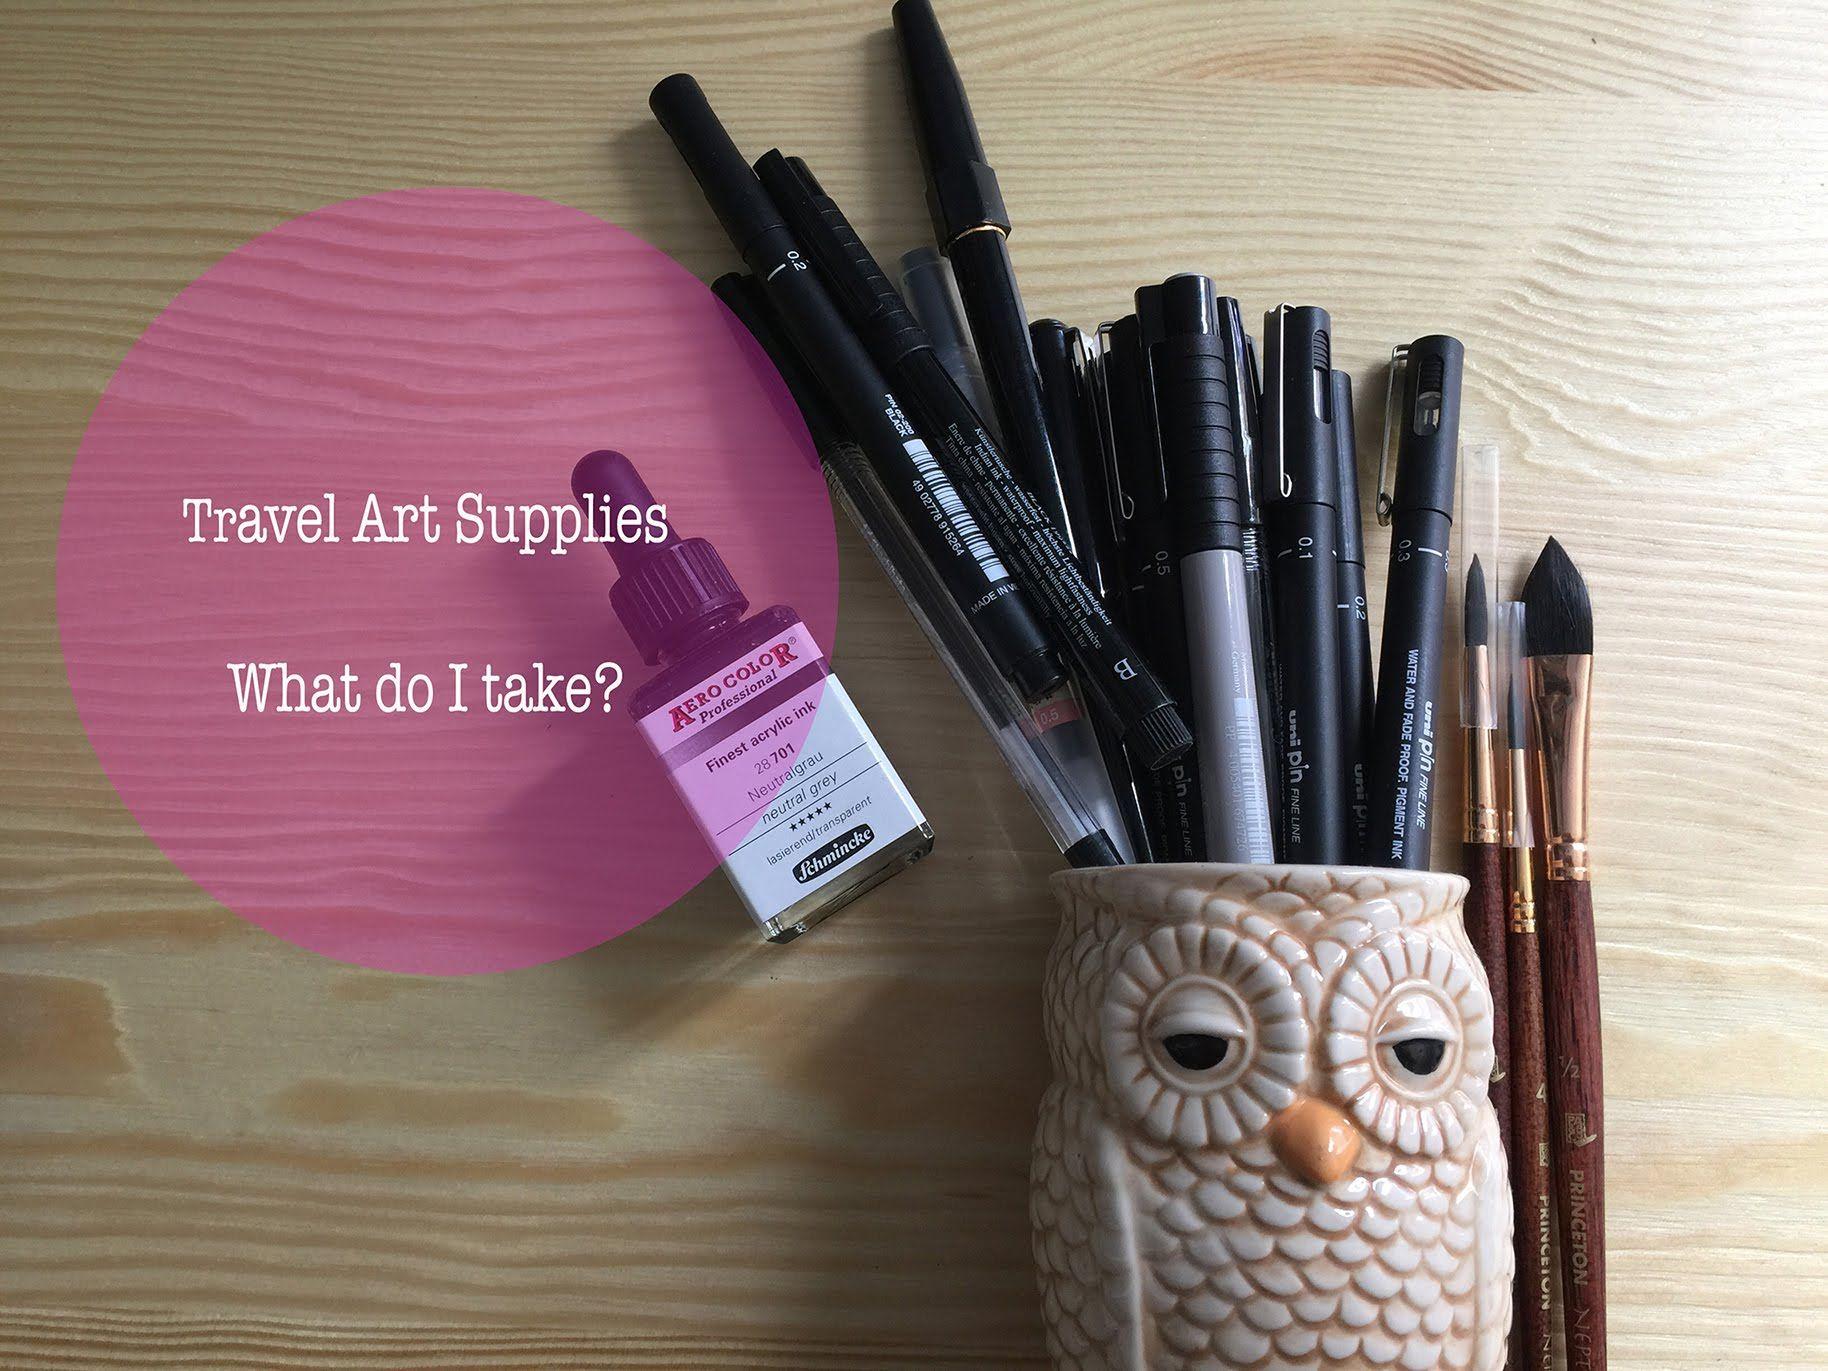 Travel Art Supplies - What Do I Take?